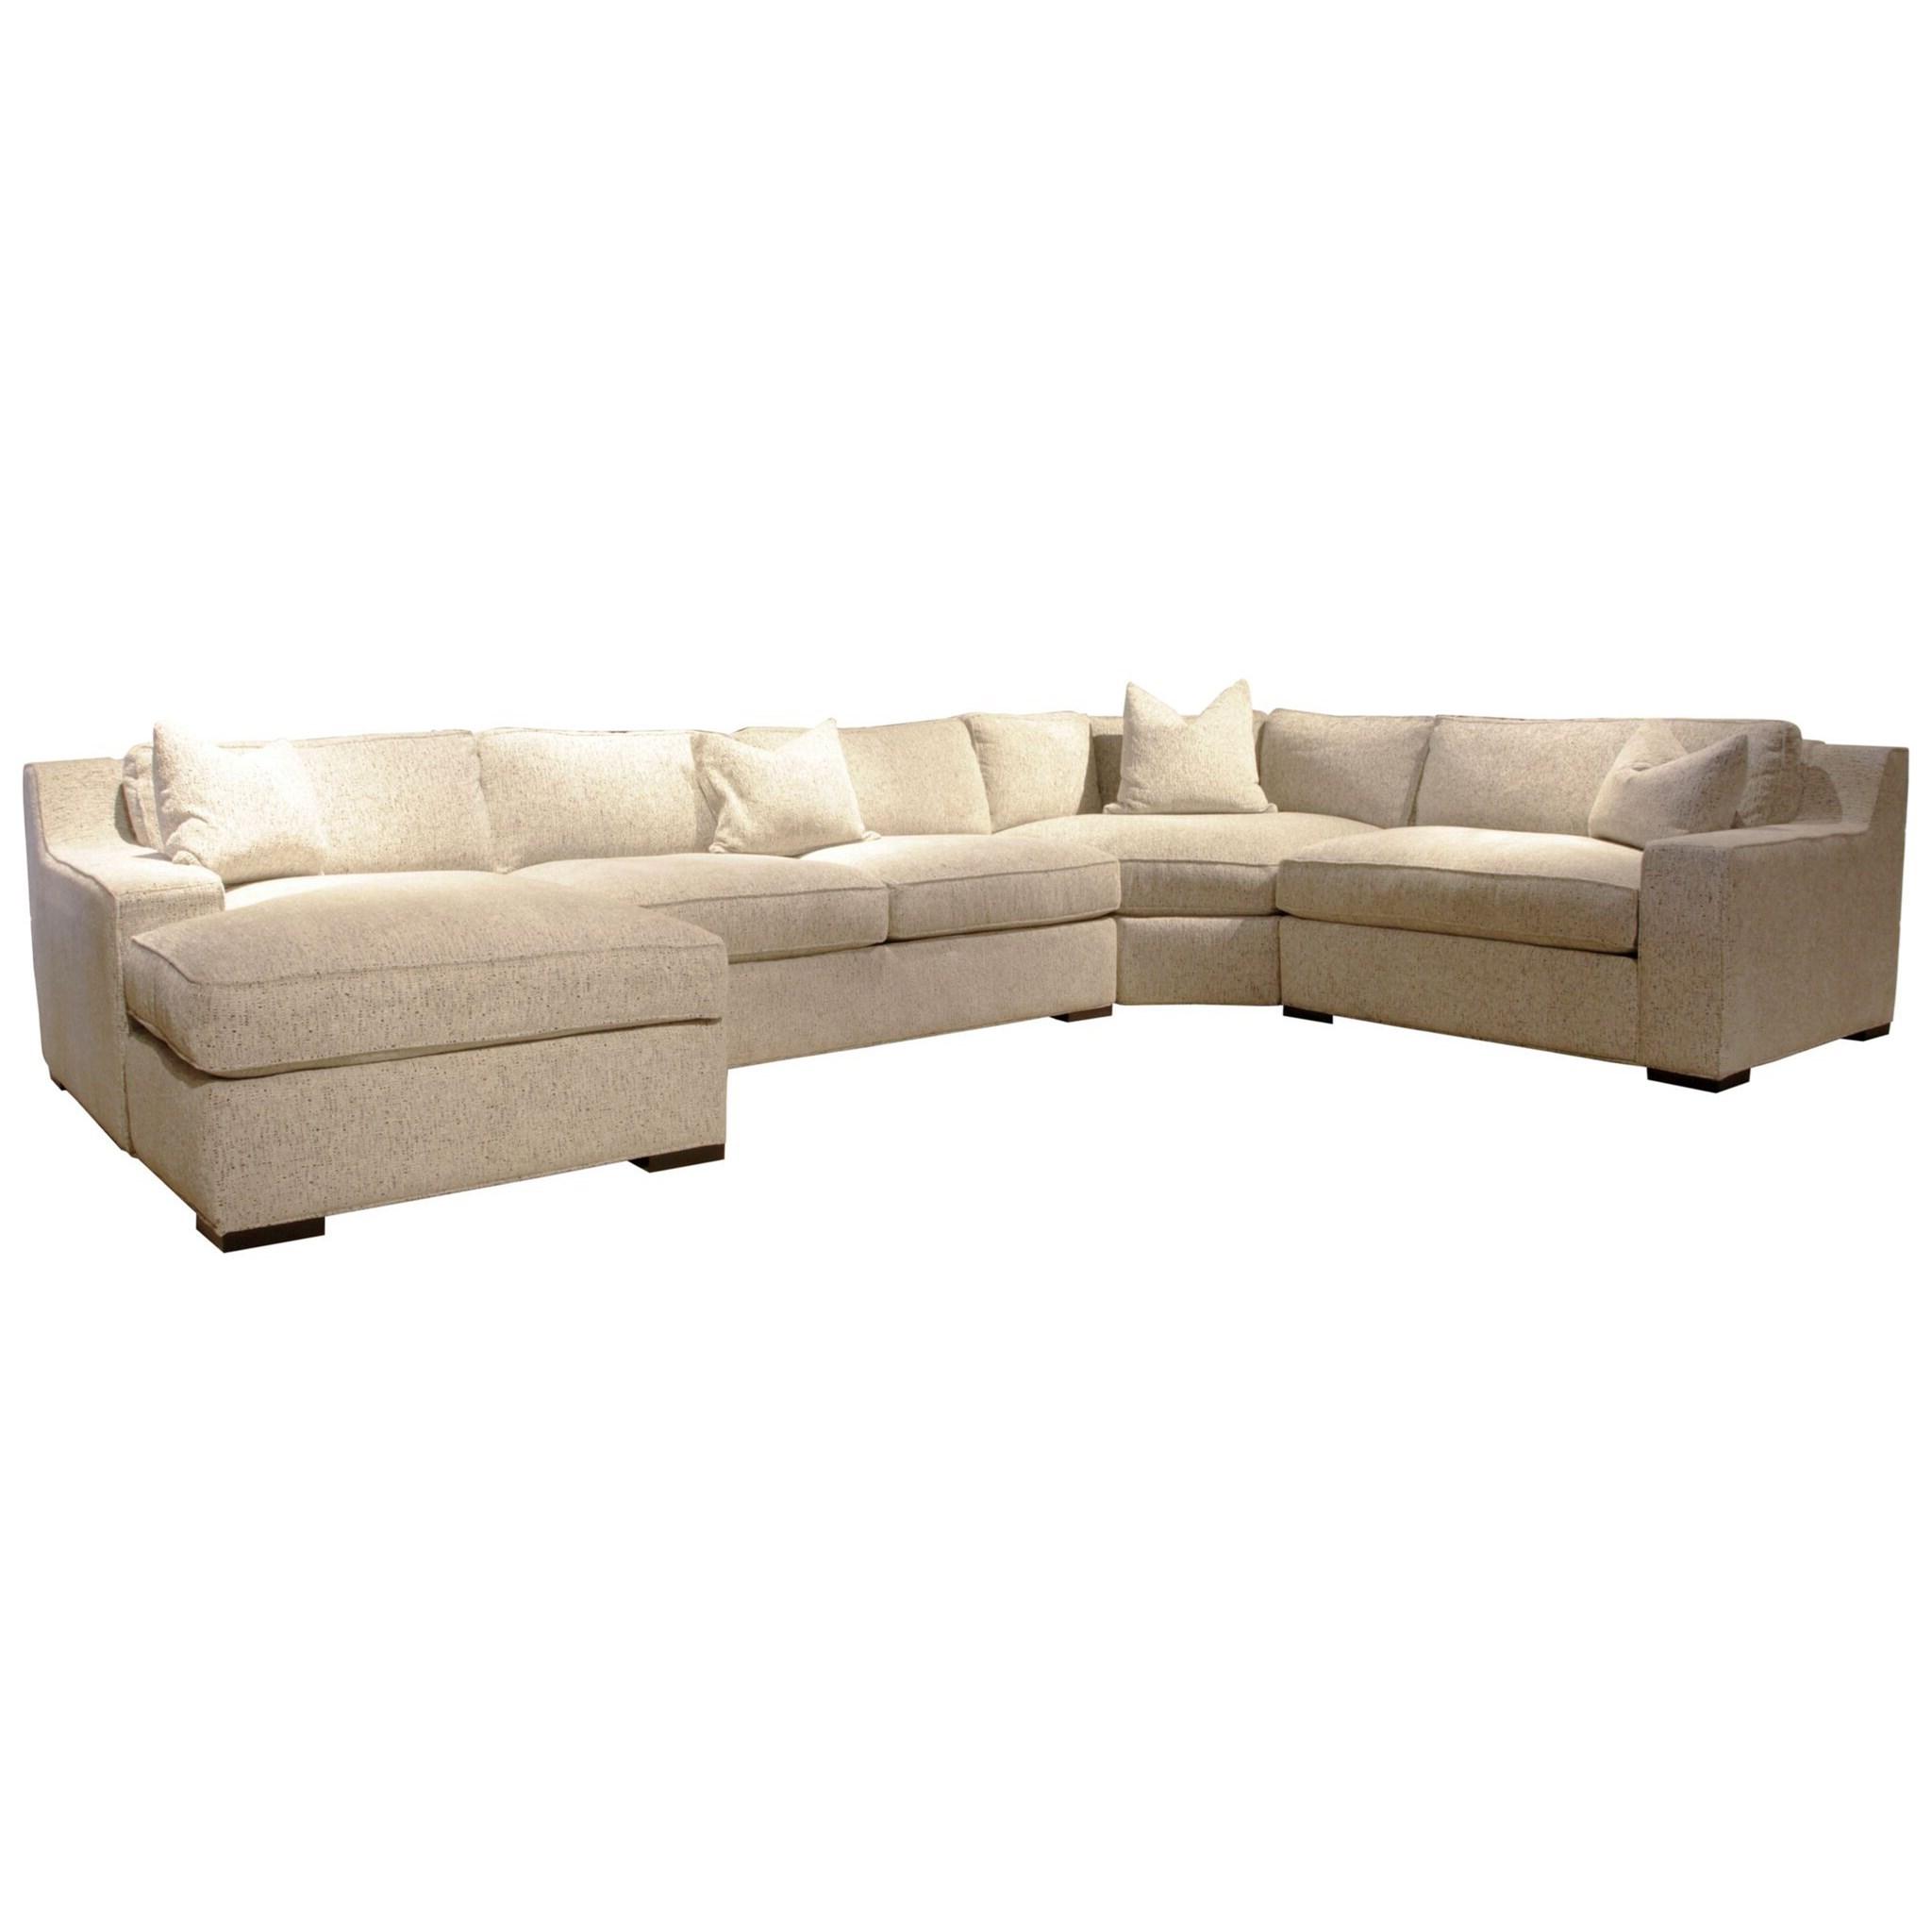 Morello Sectional Sofa by Jonathan Louis at Fashion Furniture